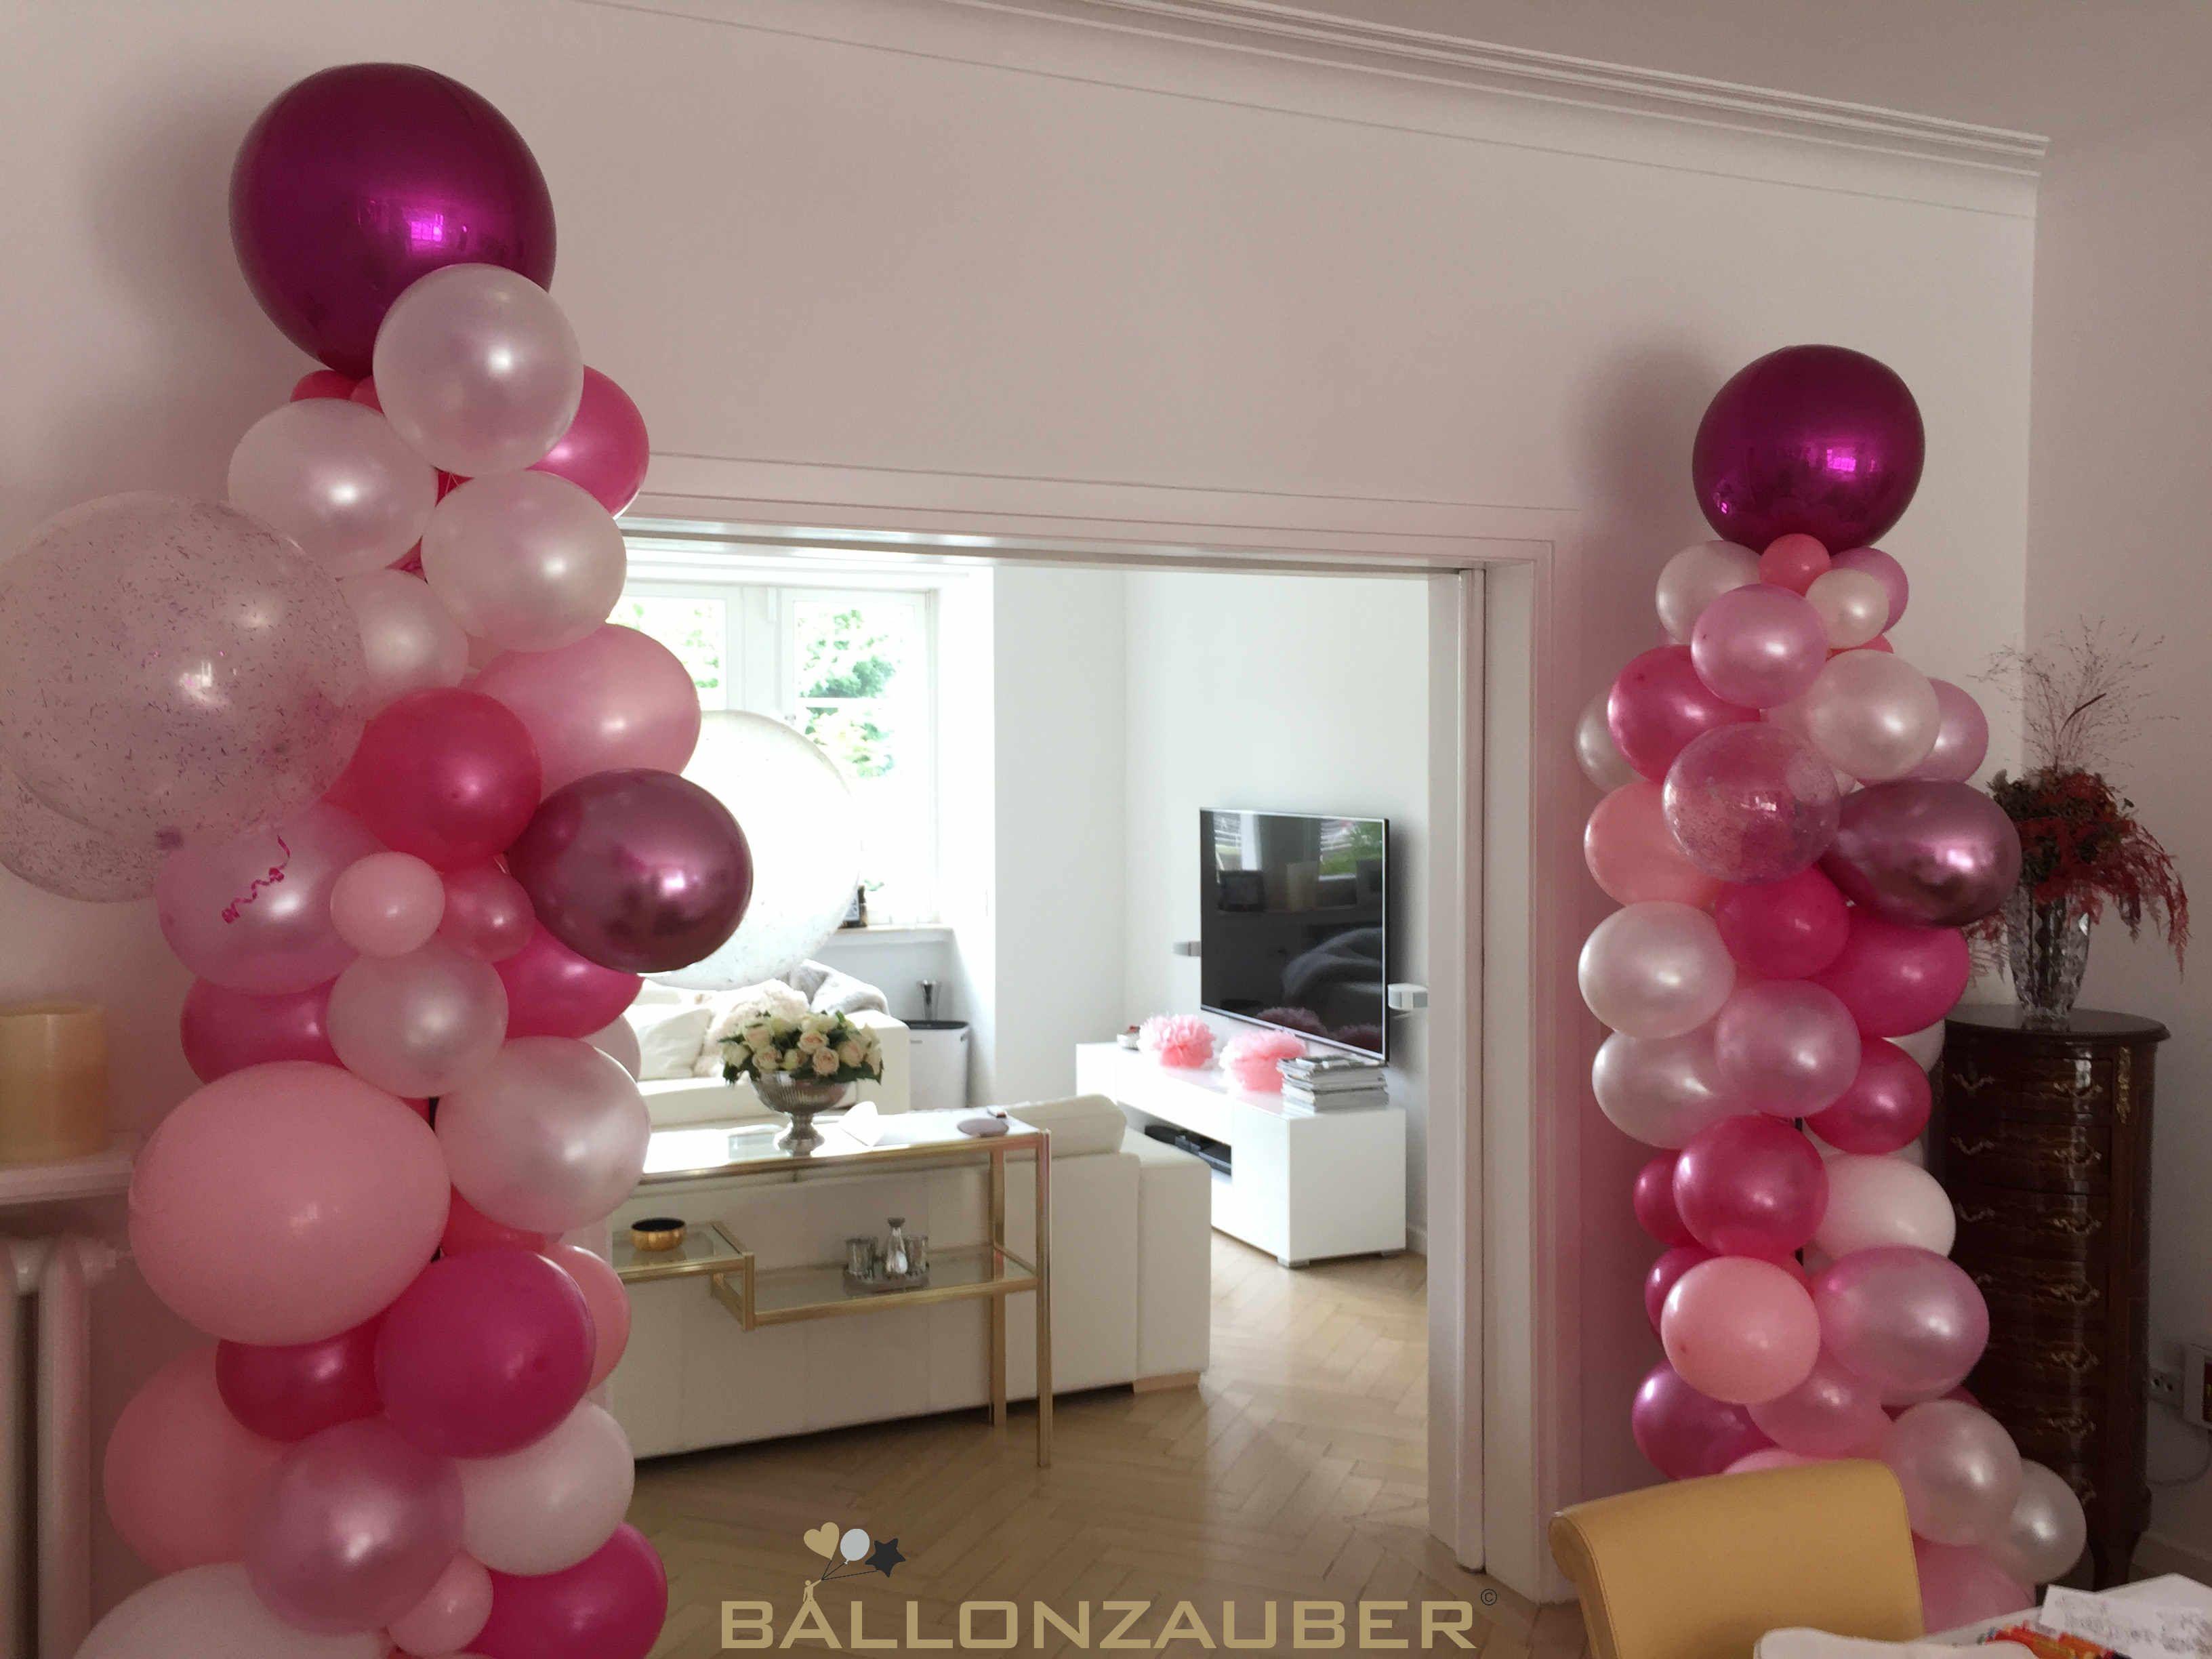 Baby Shower Diese Schonen Ballonsaulen In Den Farben Rosa Perlmutt Und Pink Wurden Organisch Aus Latexbal Ballondekorationen Ballon Dekoration Ballongirlande